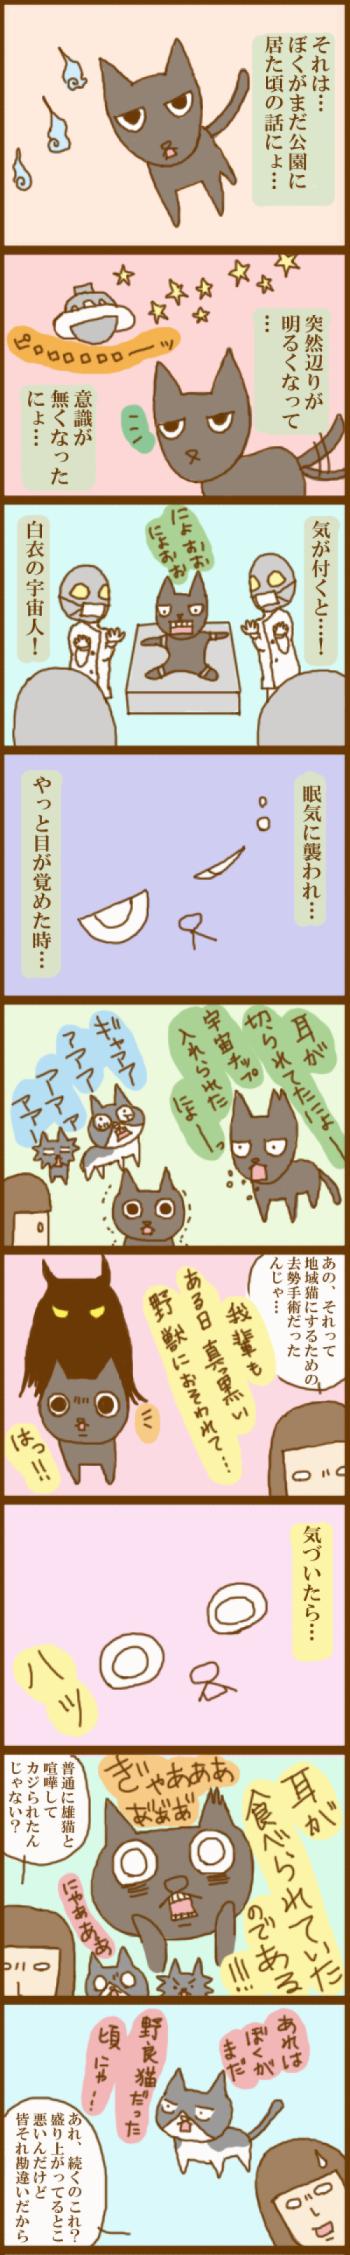 f:id:suzuokayu:20201116111524j:plain